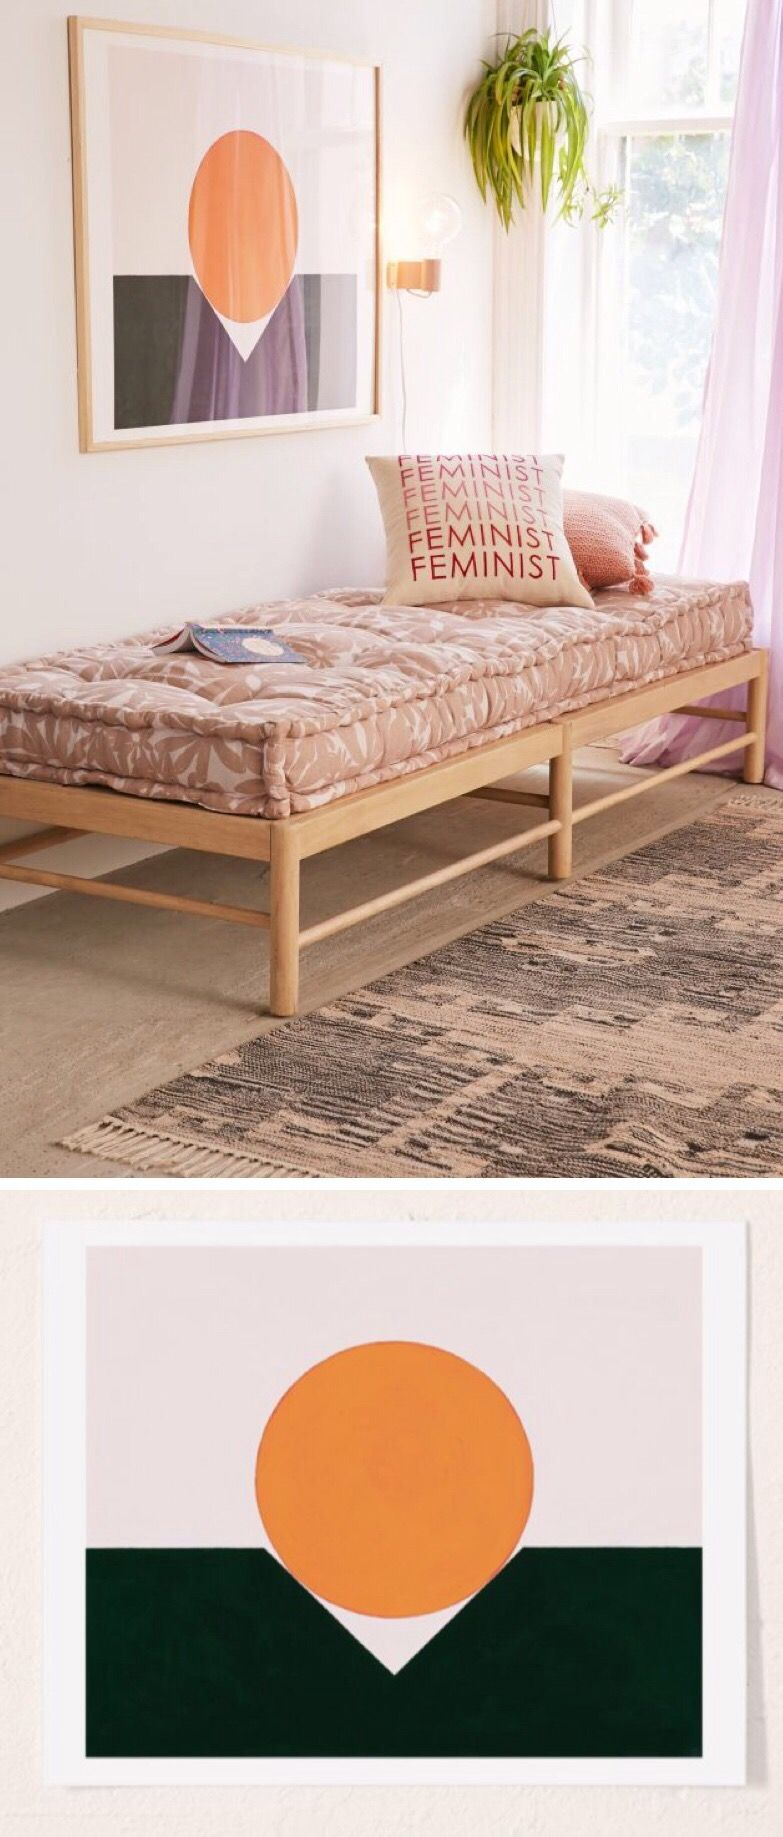 Bec Smith Life Or Something Like It Art Print In 2020 Art Prints Wood Molding Print